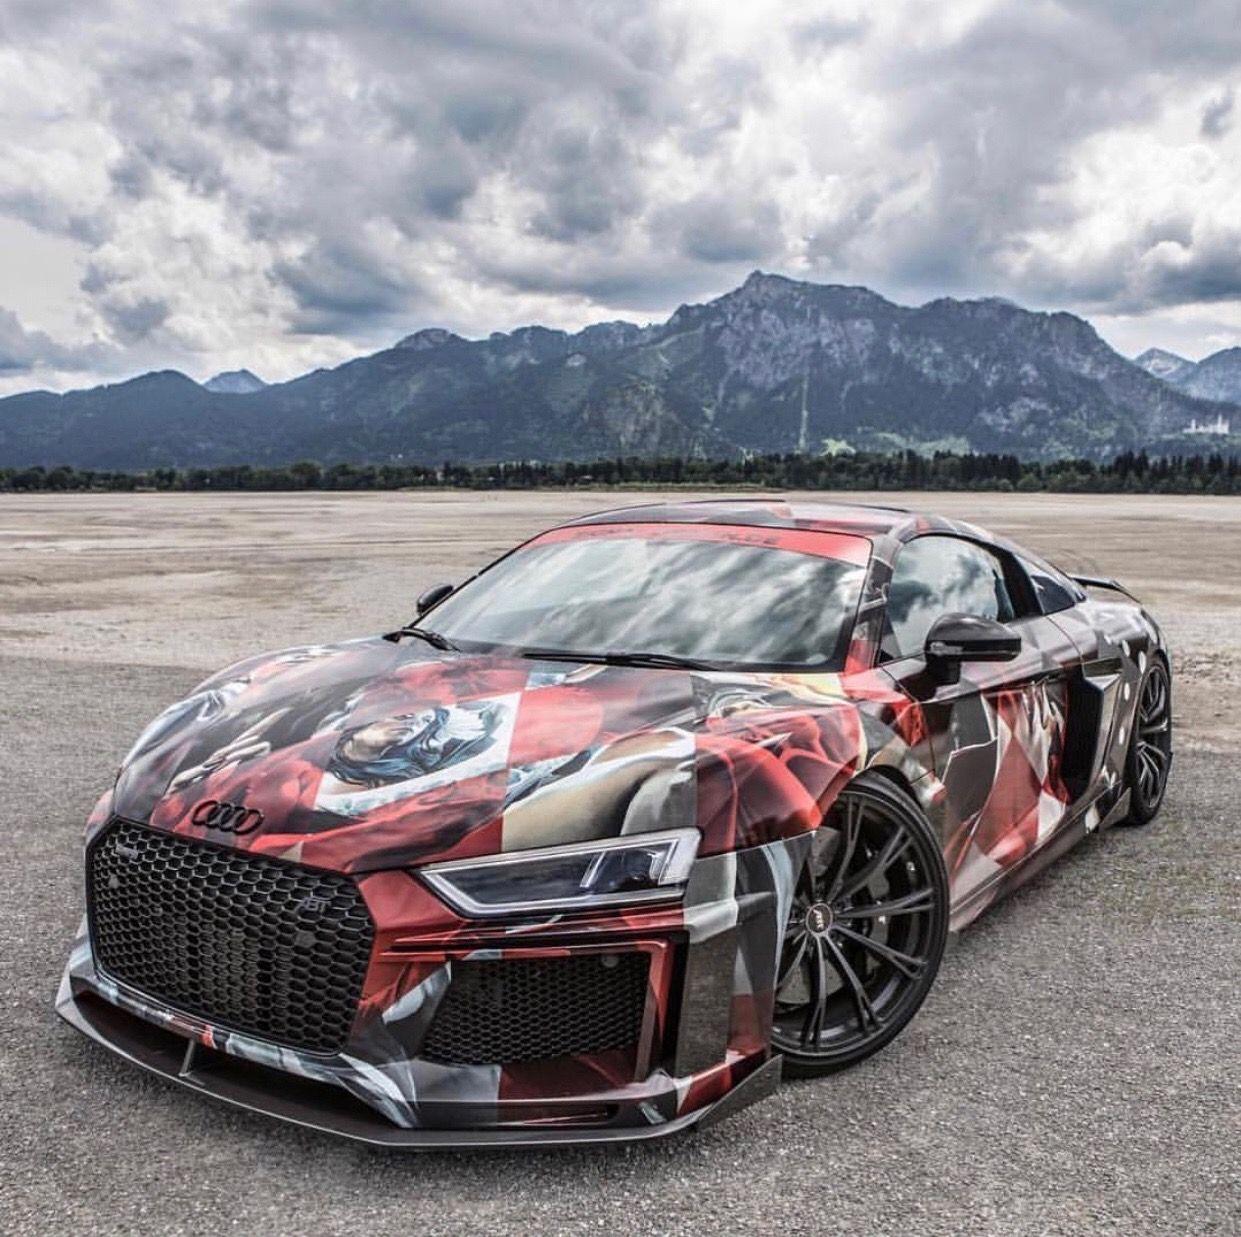 Vehiculos Deportivos Audi Sport Quattro: Superdeportivos, Autos